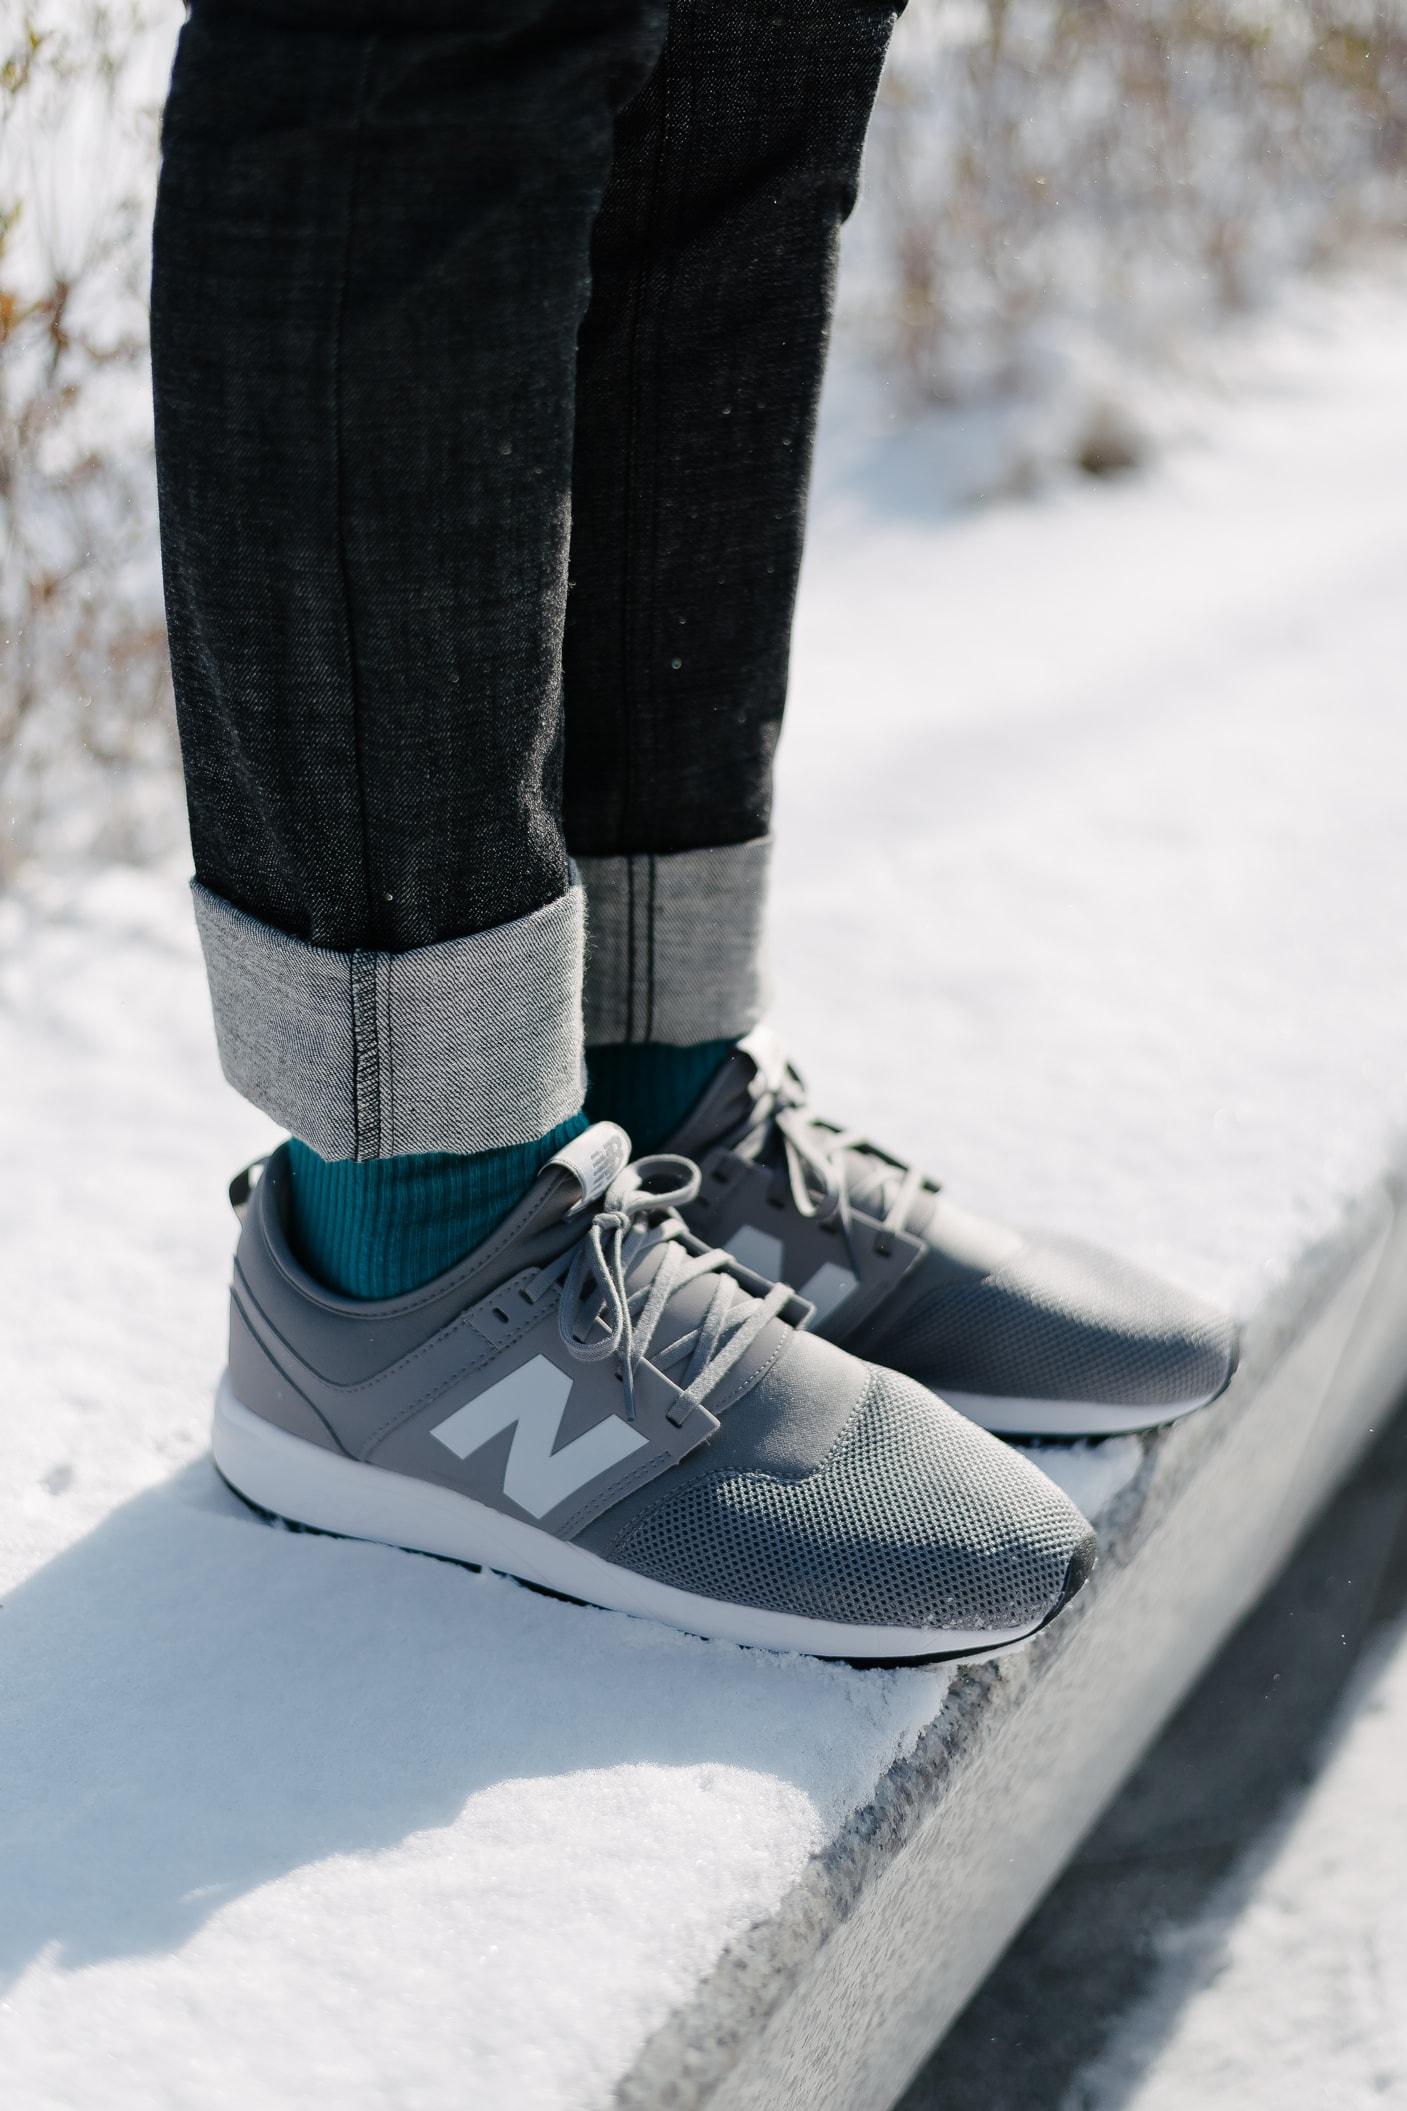 New Balance 247 Classic SAMBYPEN King Cookdaily grey white seoul